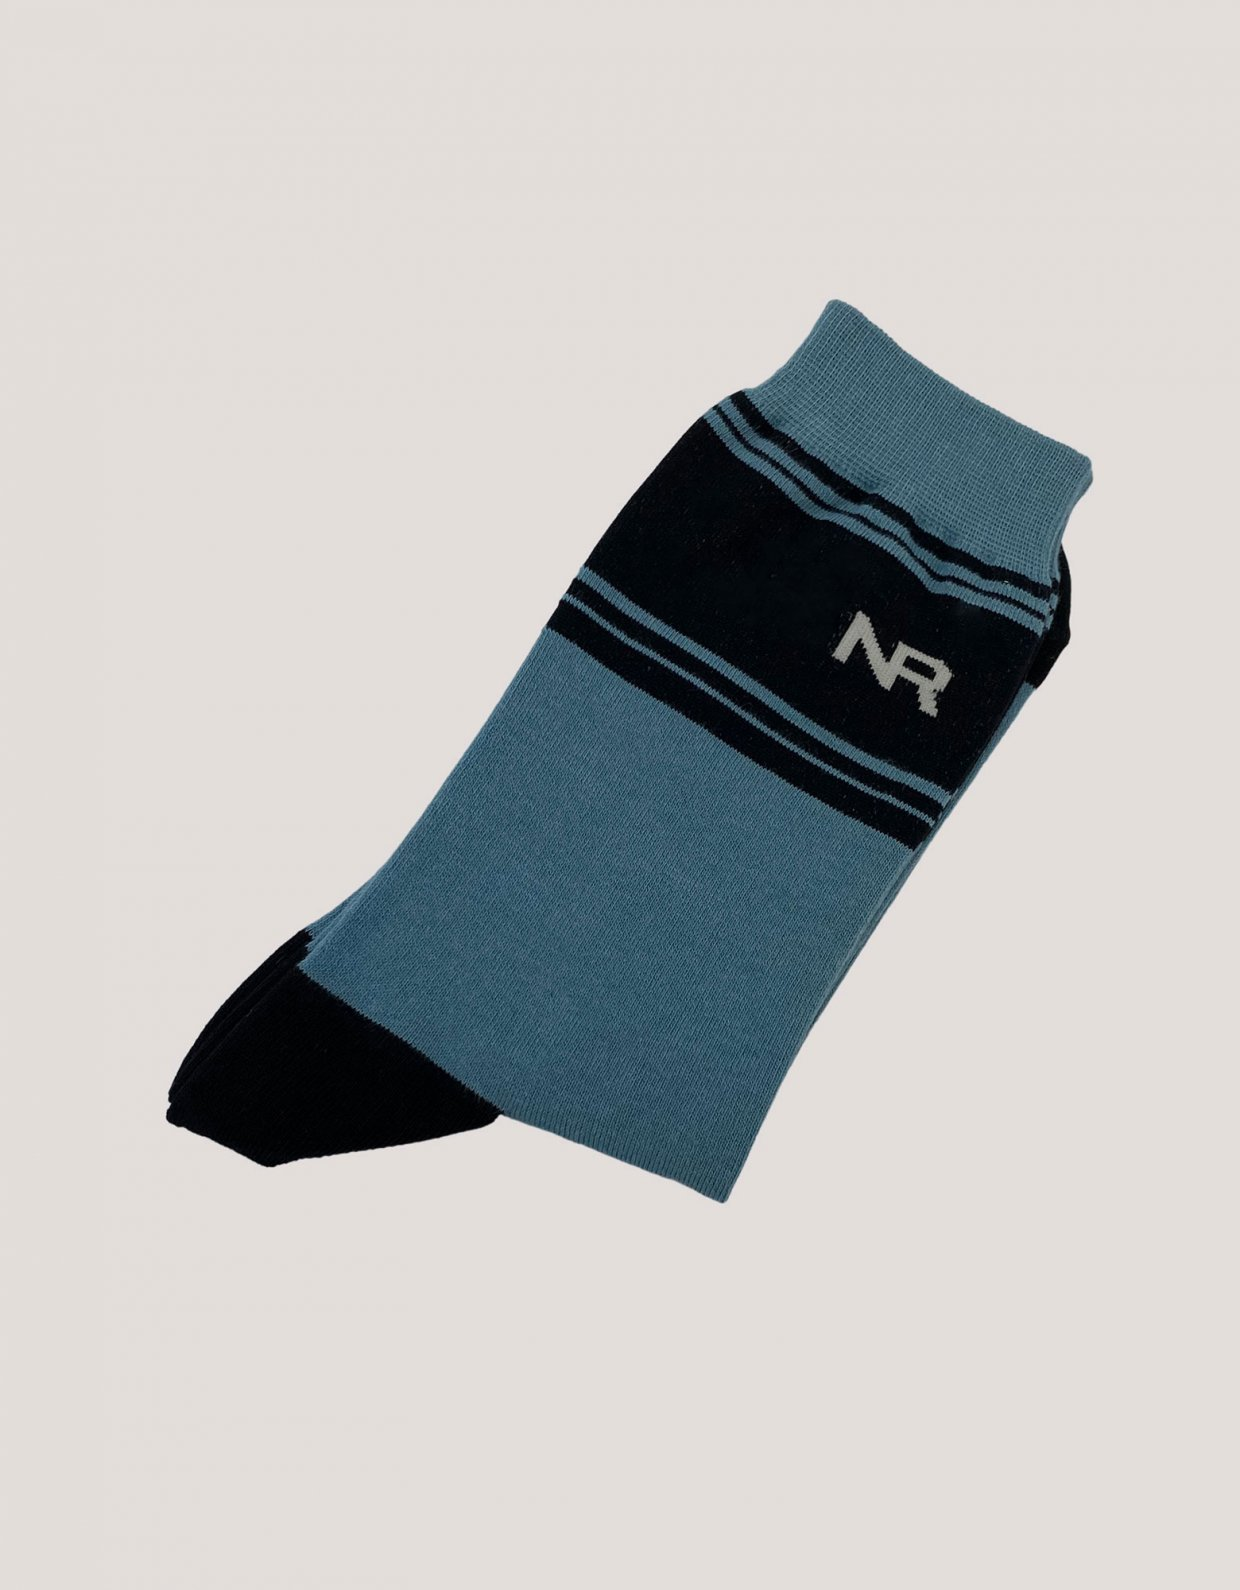 Nadia Rapti Stripes n logo socks blue